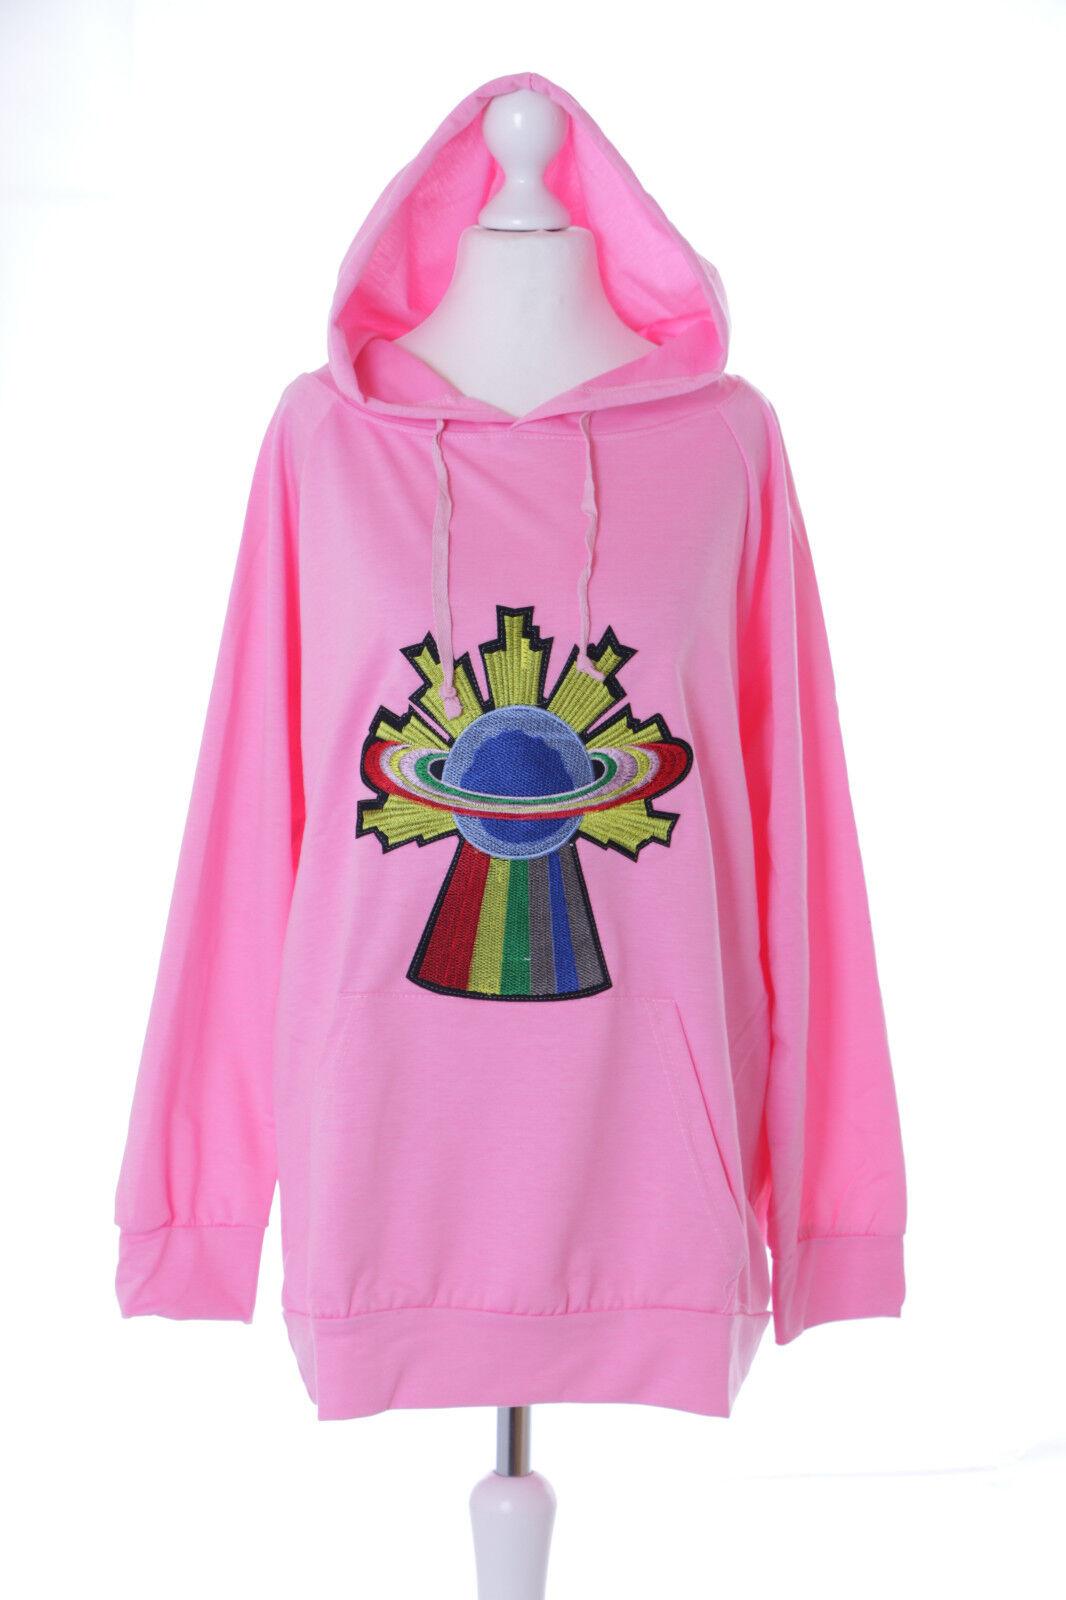 TS-139 Planet Earth Rainbow Neon Pink Pastel Goth Retro Jumper Sweatshirt